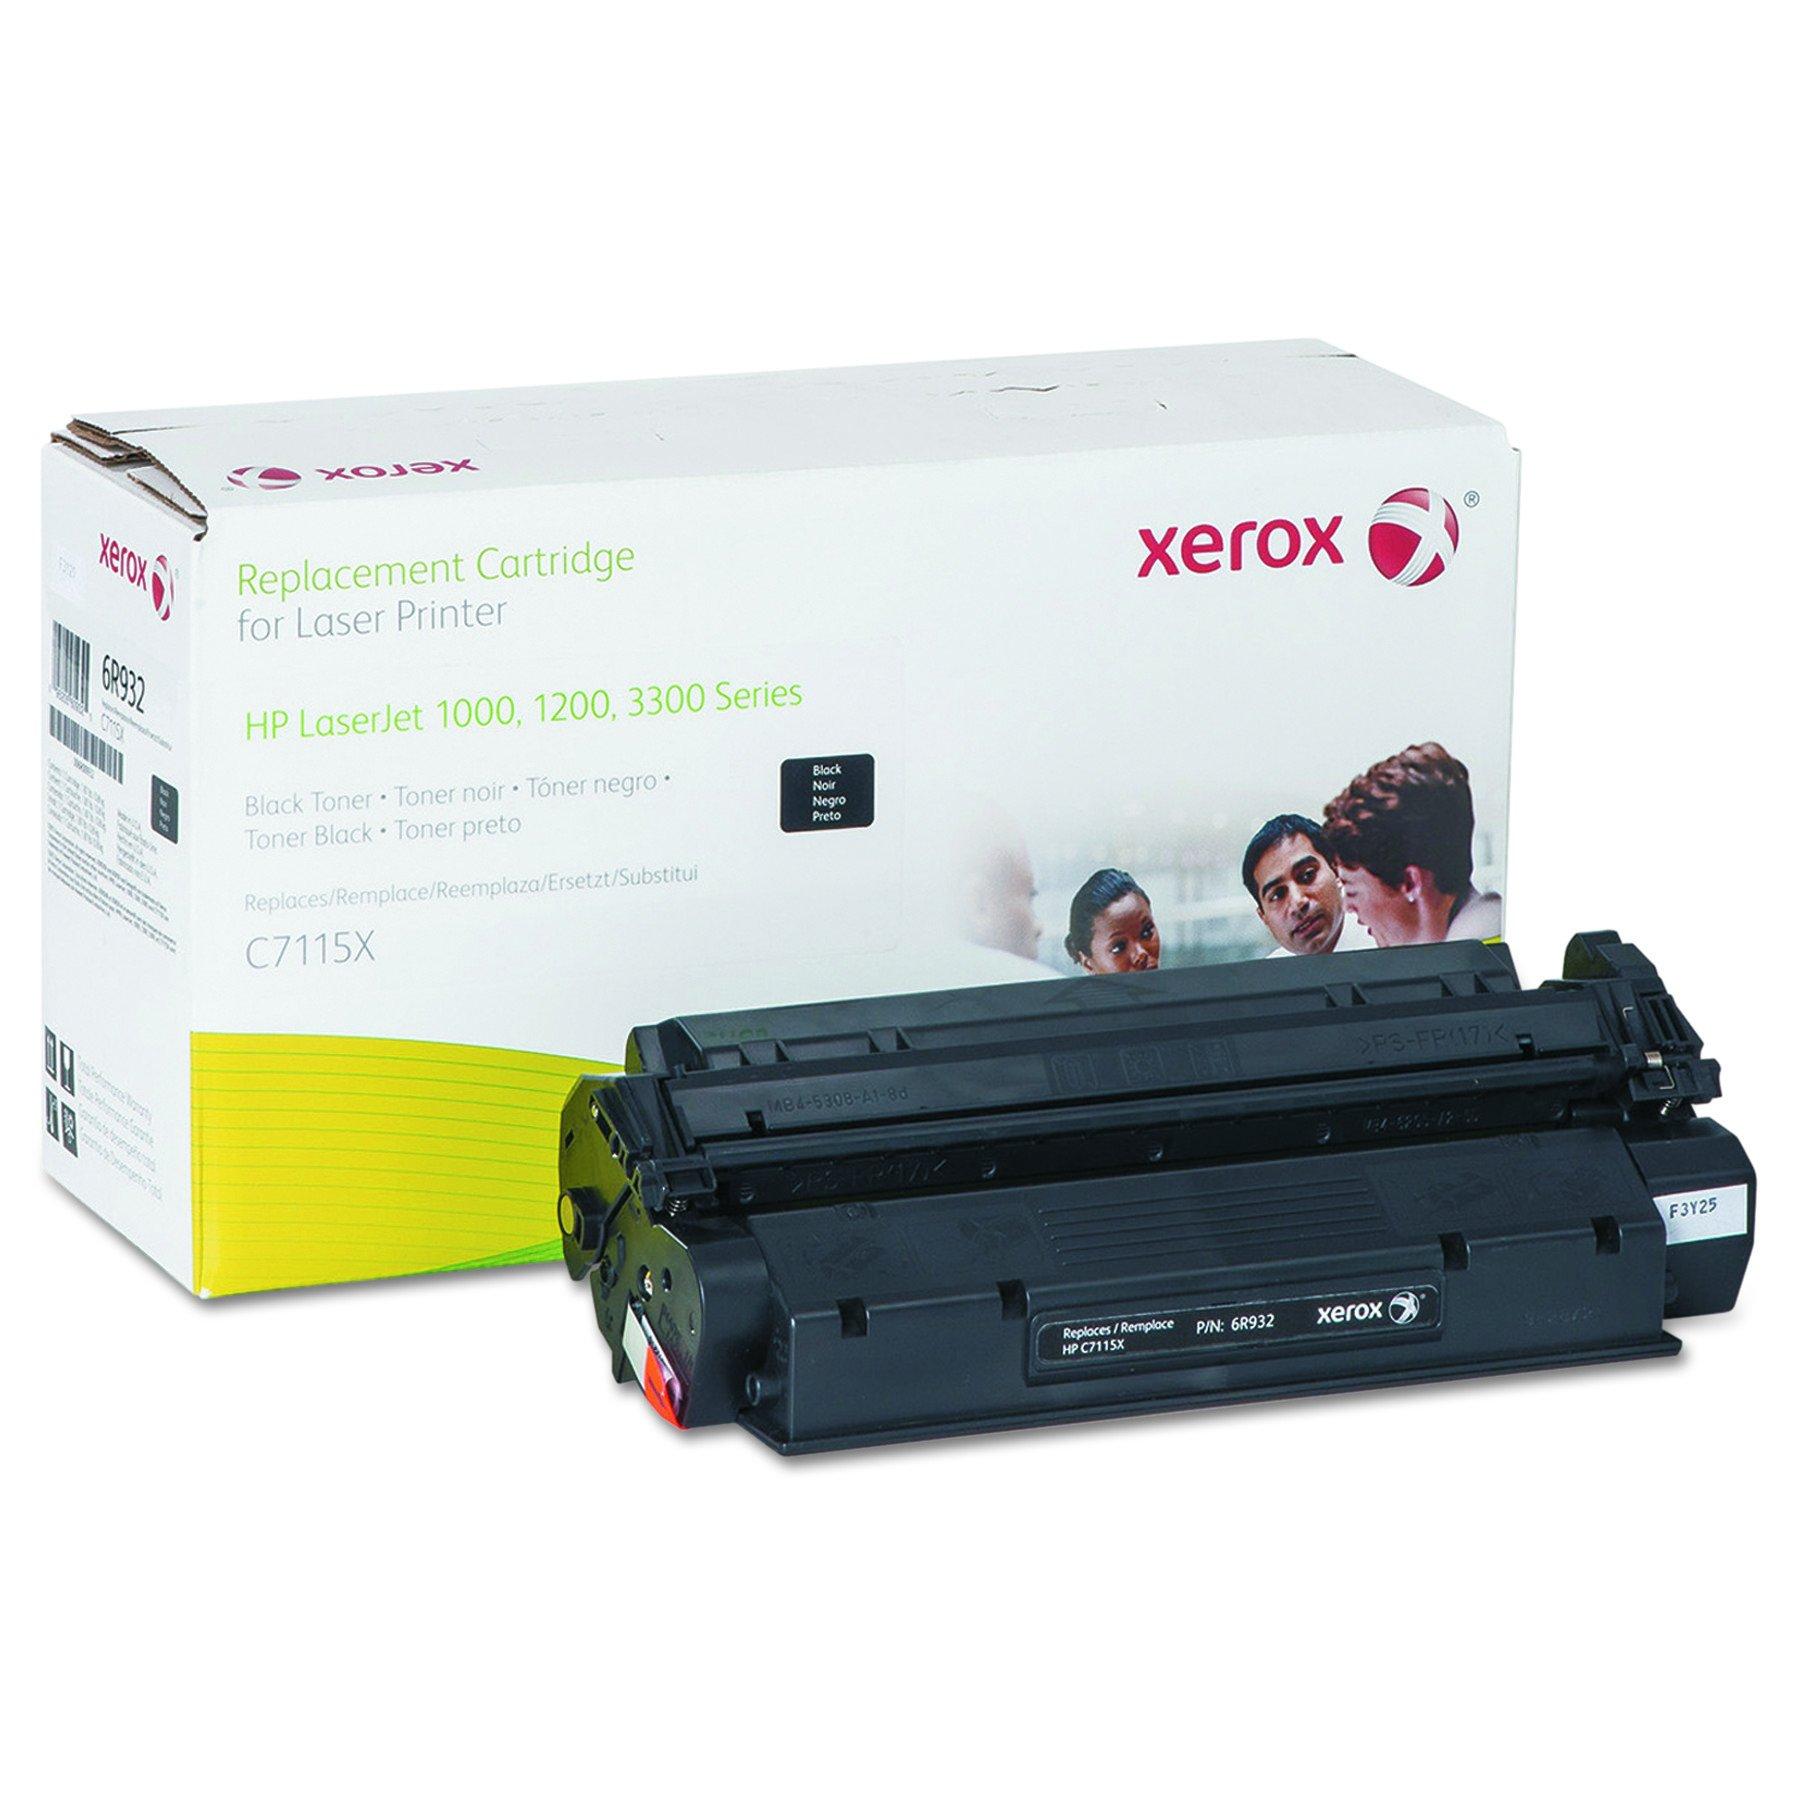 Toner Original XEROX para HP LaserJet - 6R932-(C7115X)(006R00932)